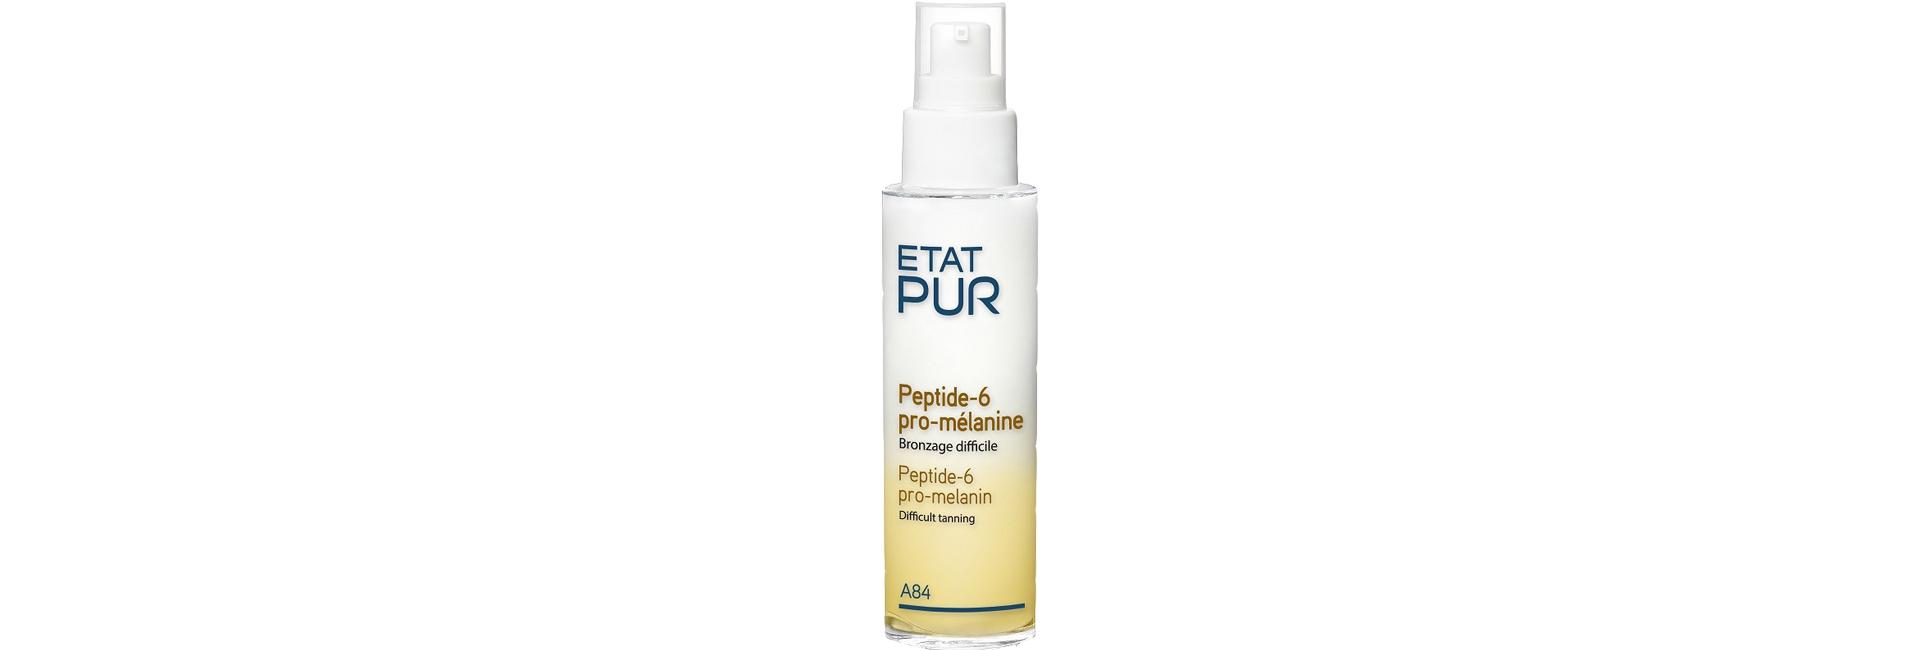 etat-pur-peptide-6-pro-melanine-blog-beaute-soin-patfum-homme